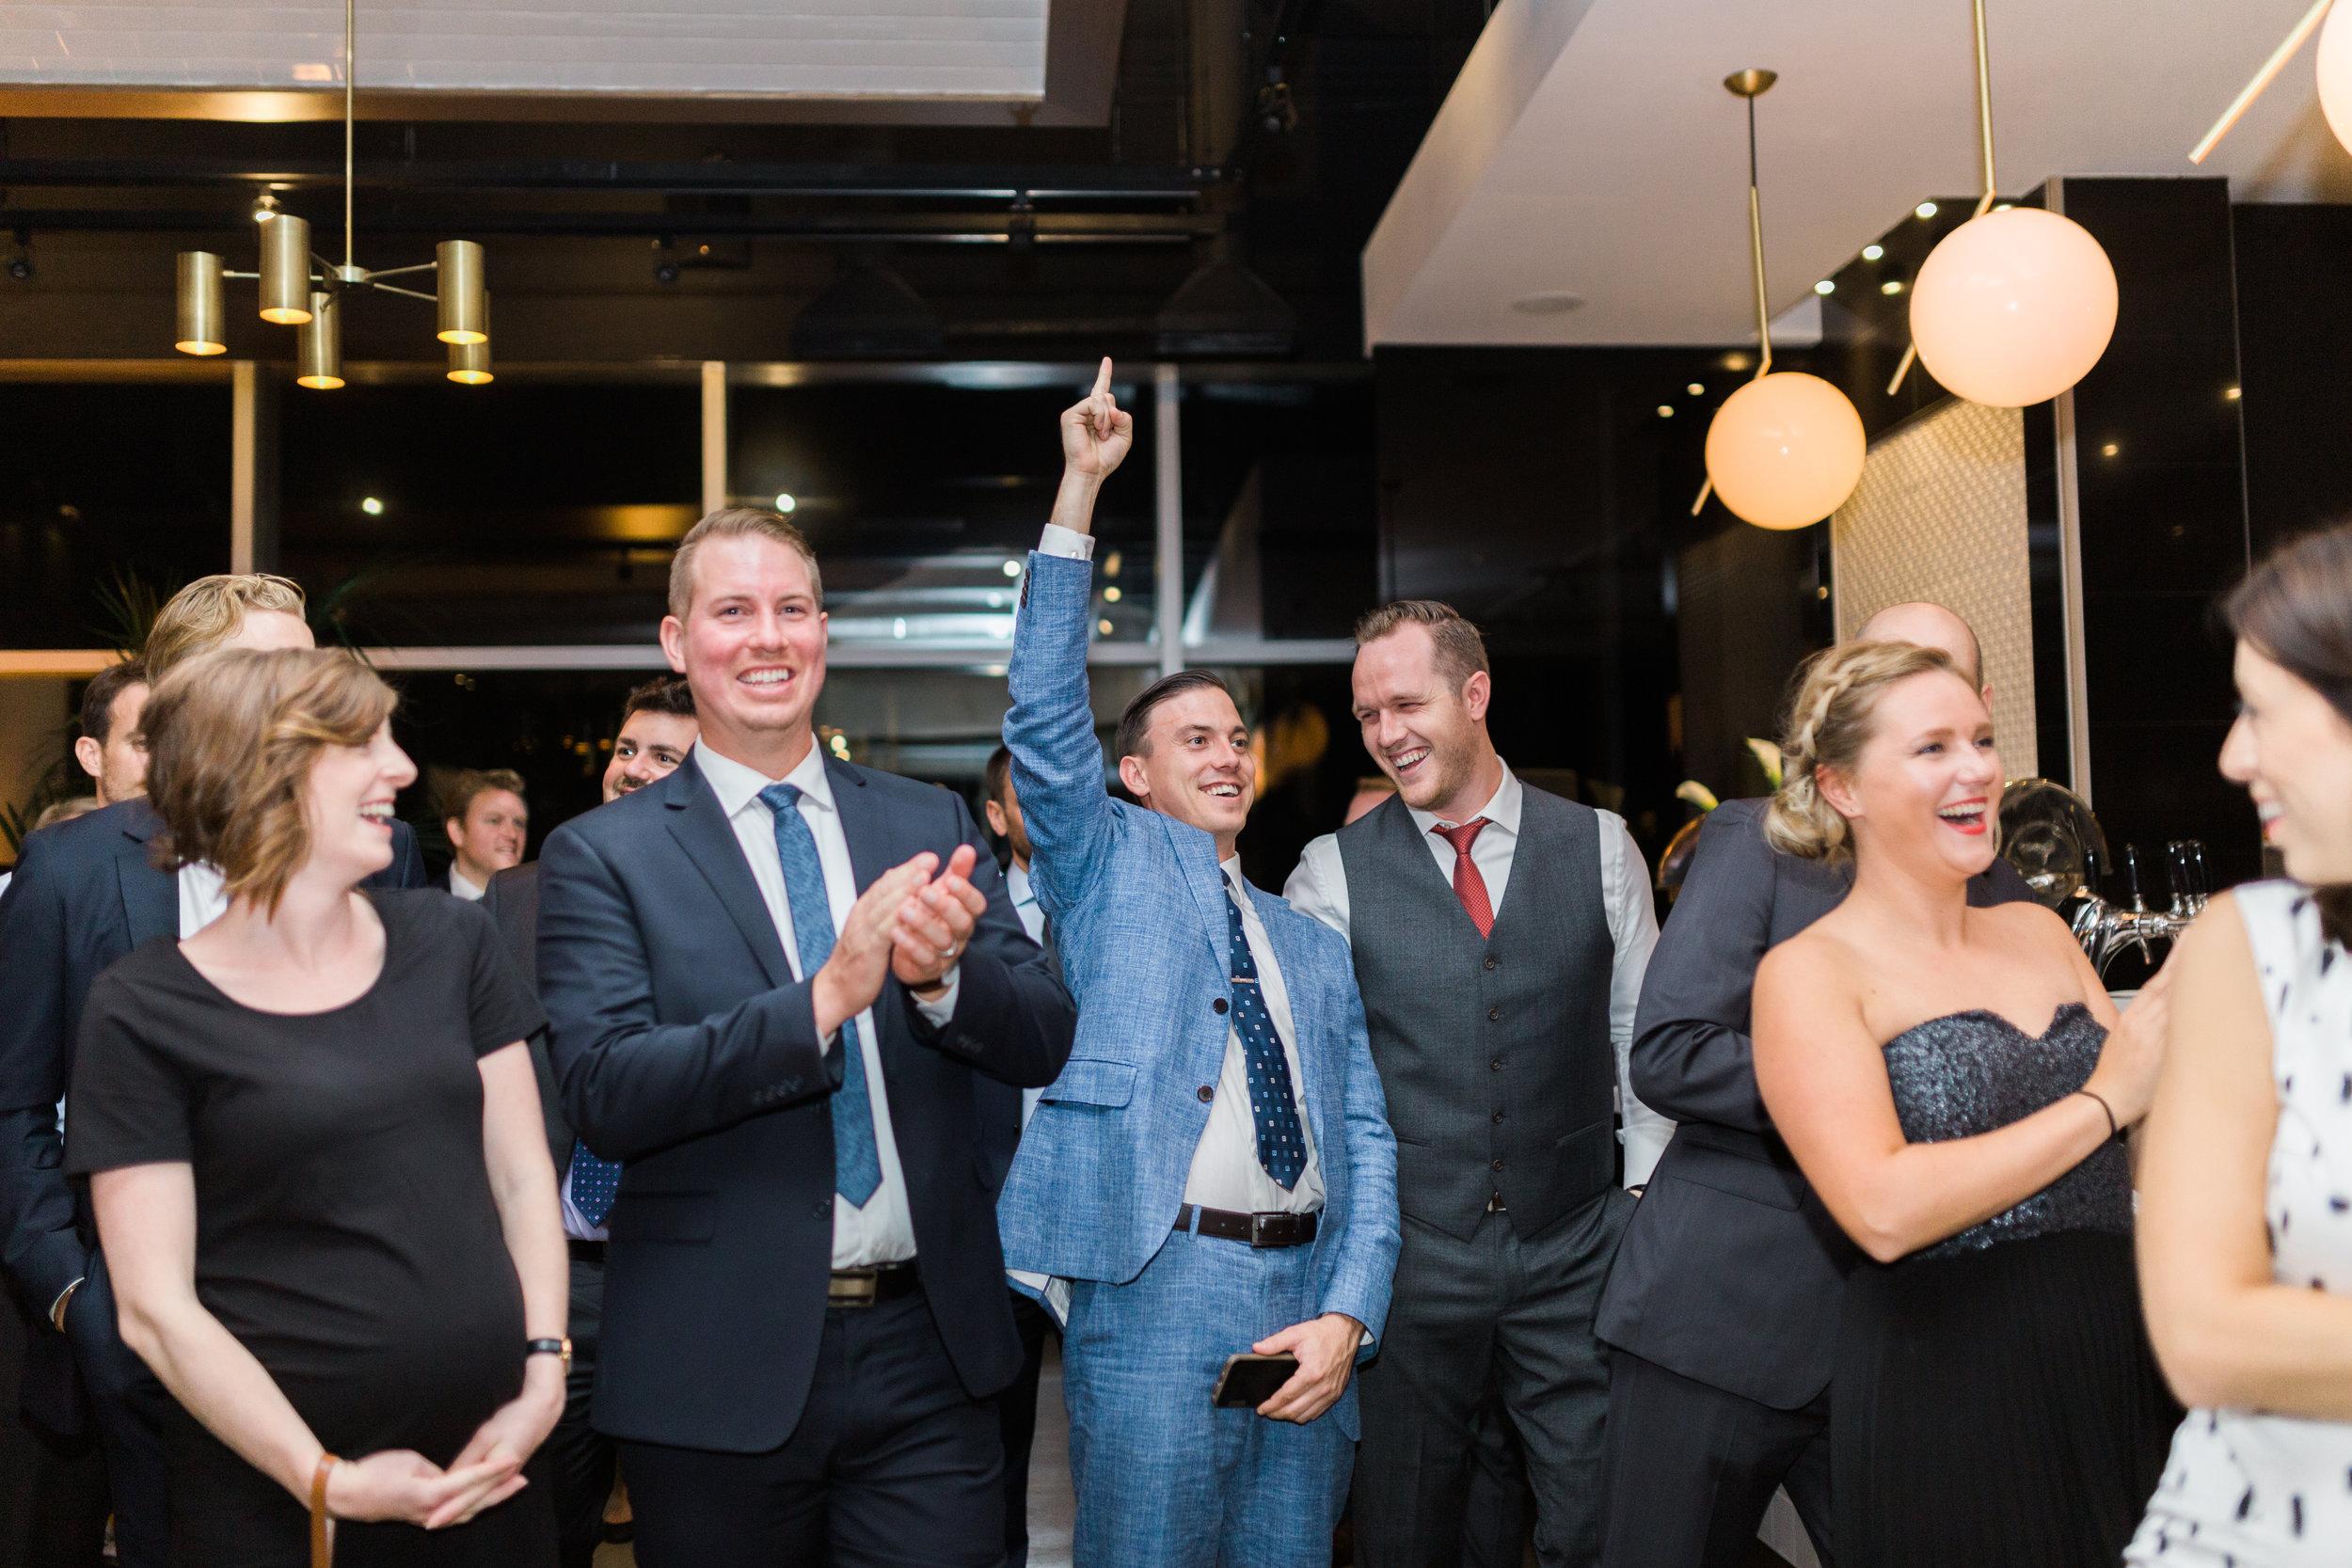 Toronto Fine Art Photographer - 180 Restaurant Wedding - Ceremony-133.jpg